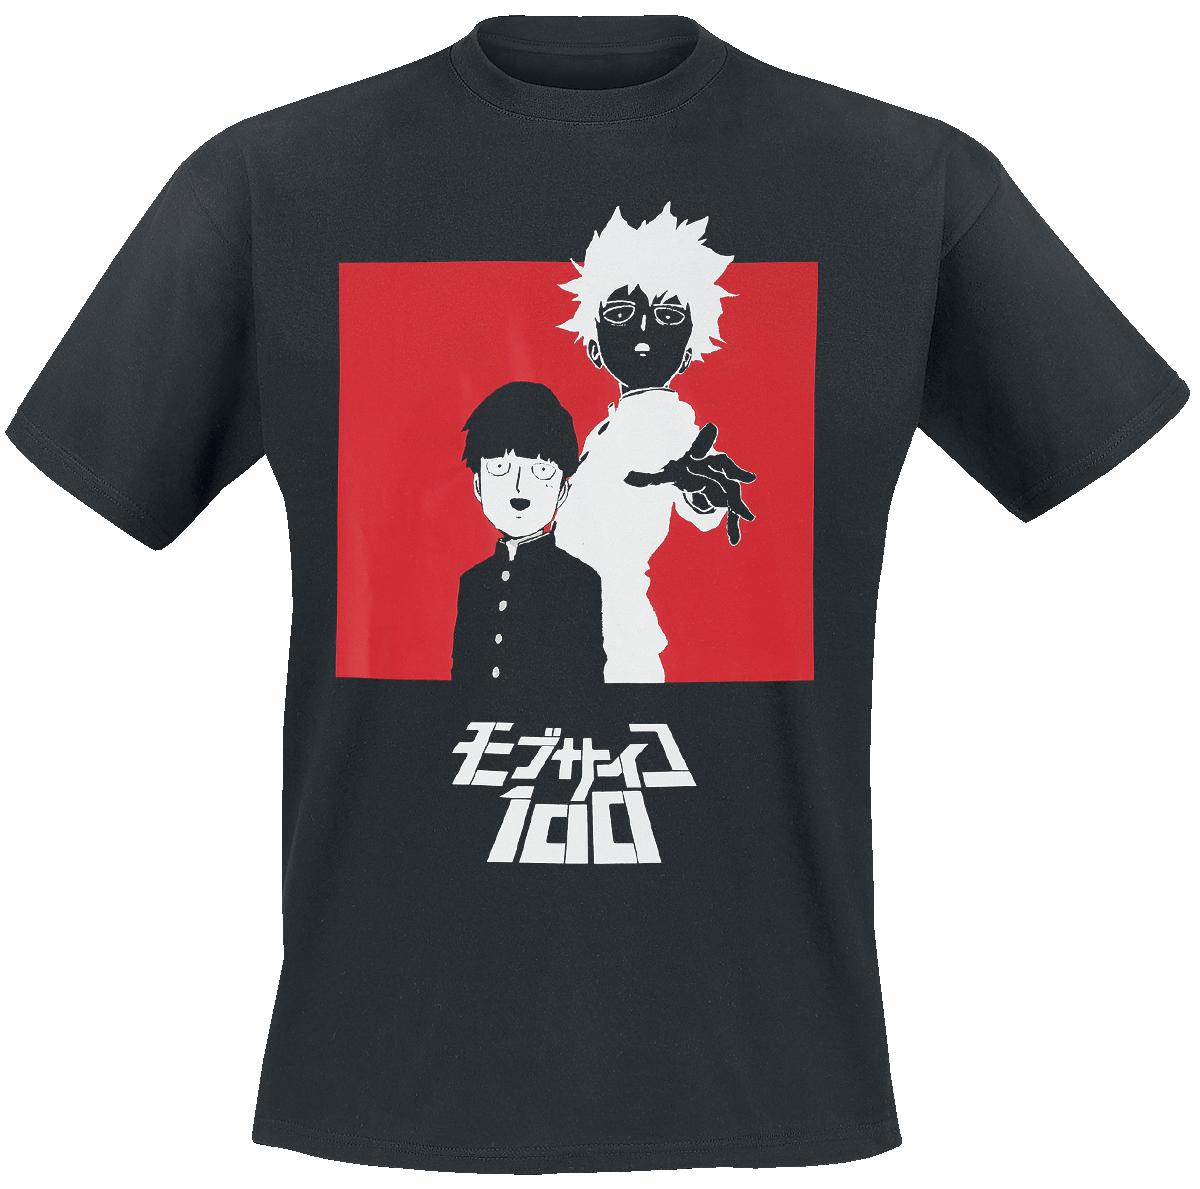 Mob Psycho 100 - Shigeo Kageyama - T-Shirt - black image